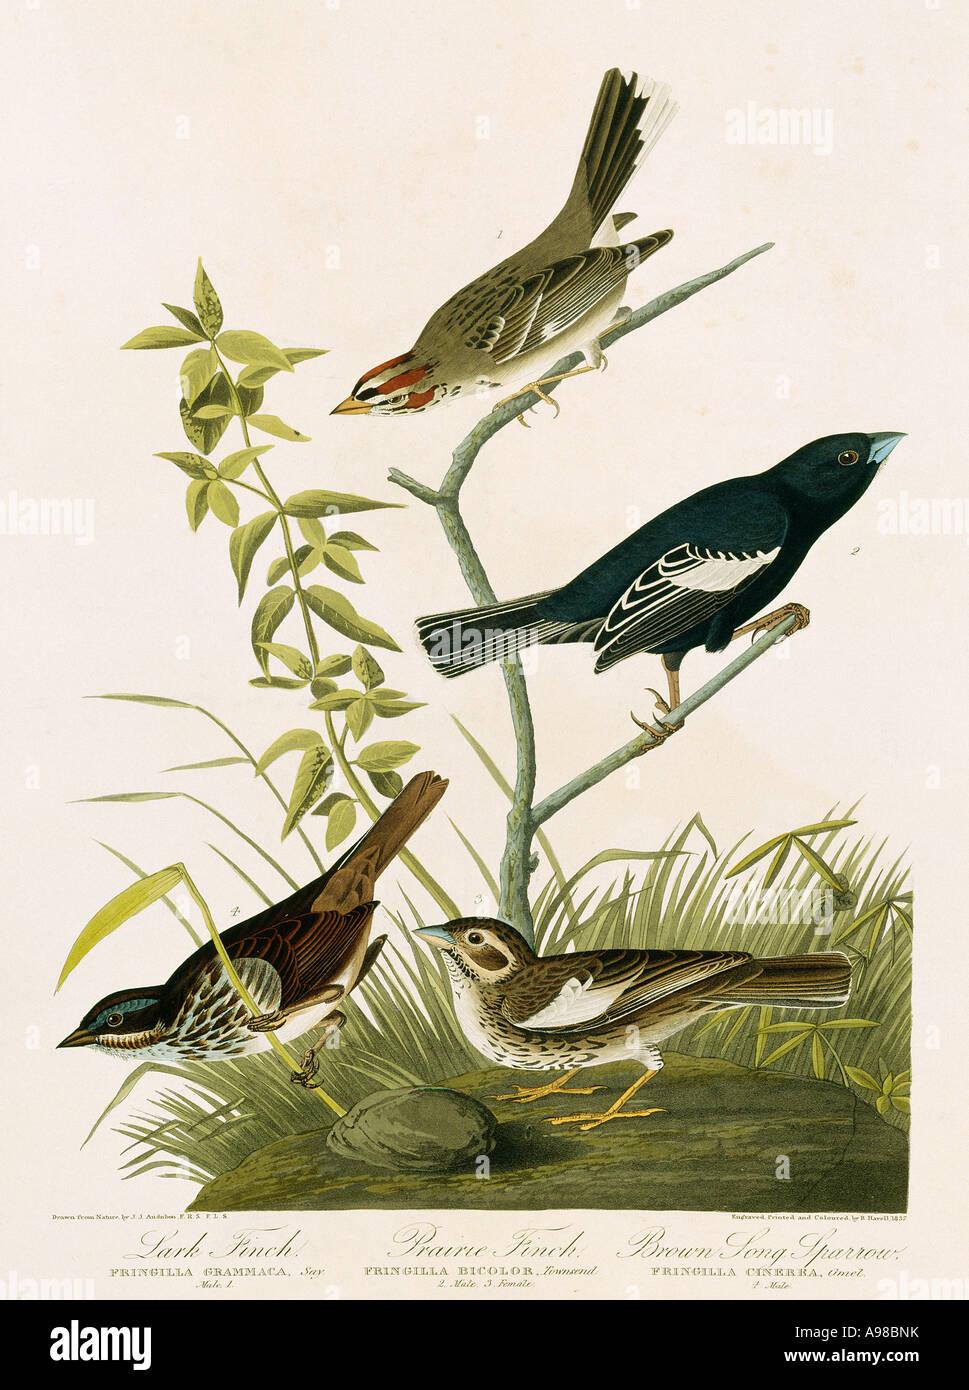 Calamospiza melanocorys Chondestes grammacus Melospiza melodia - Stock Image